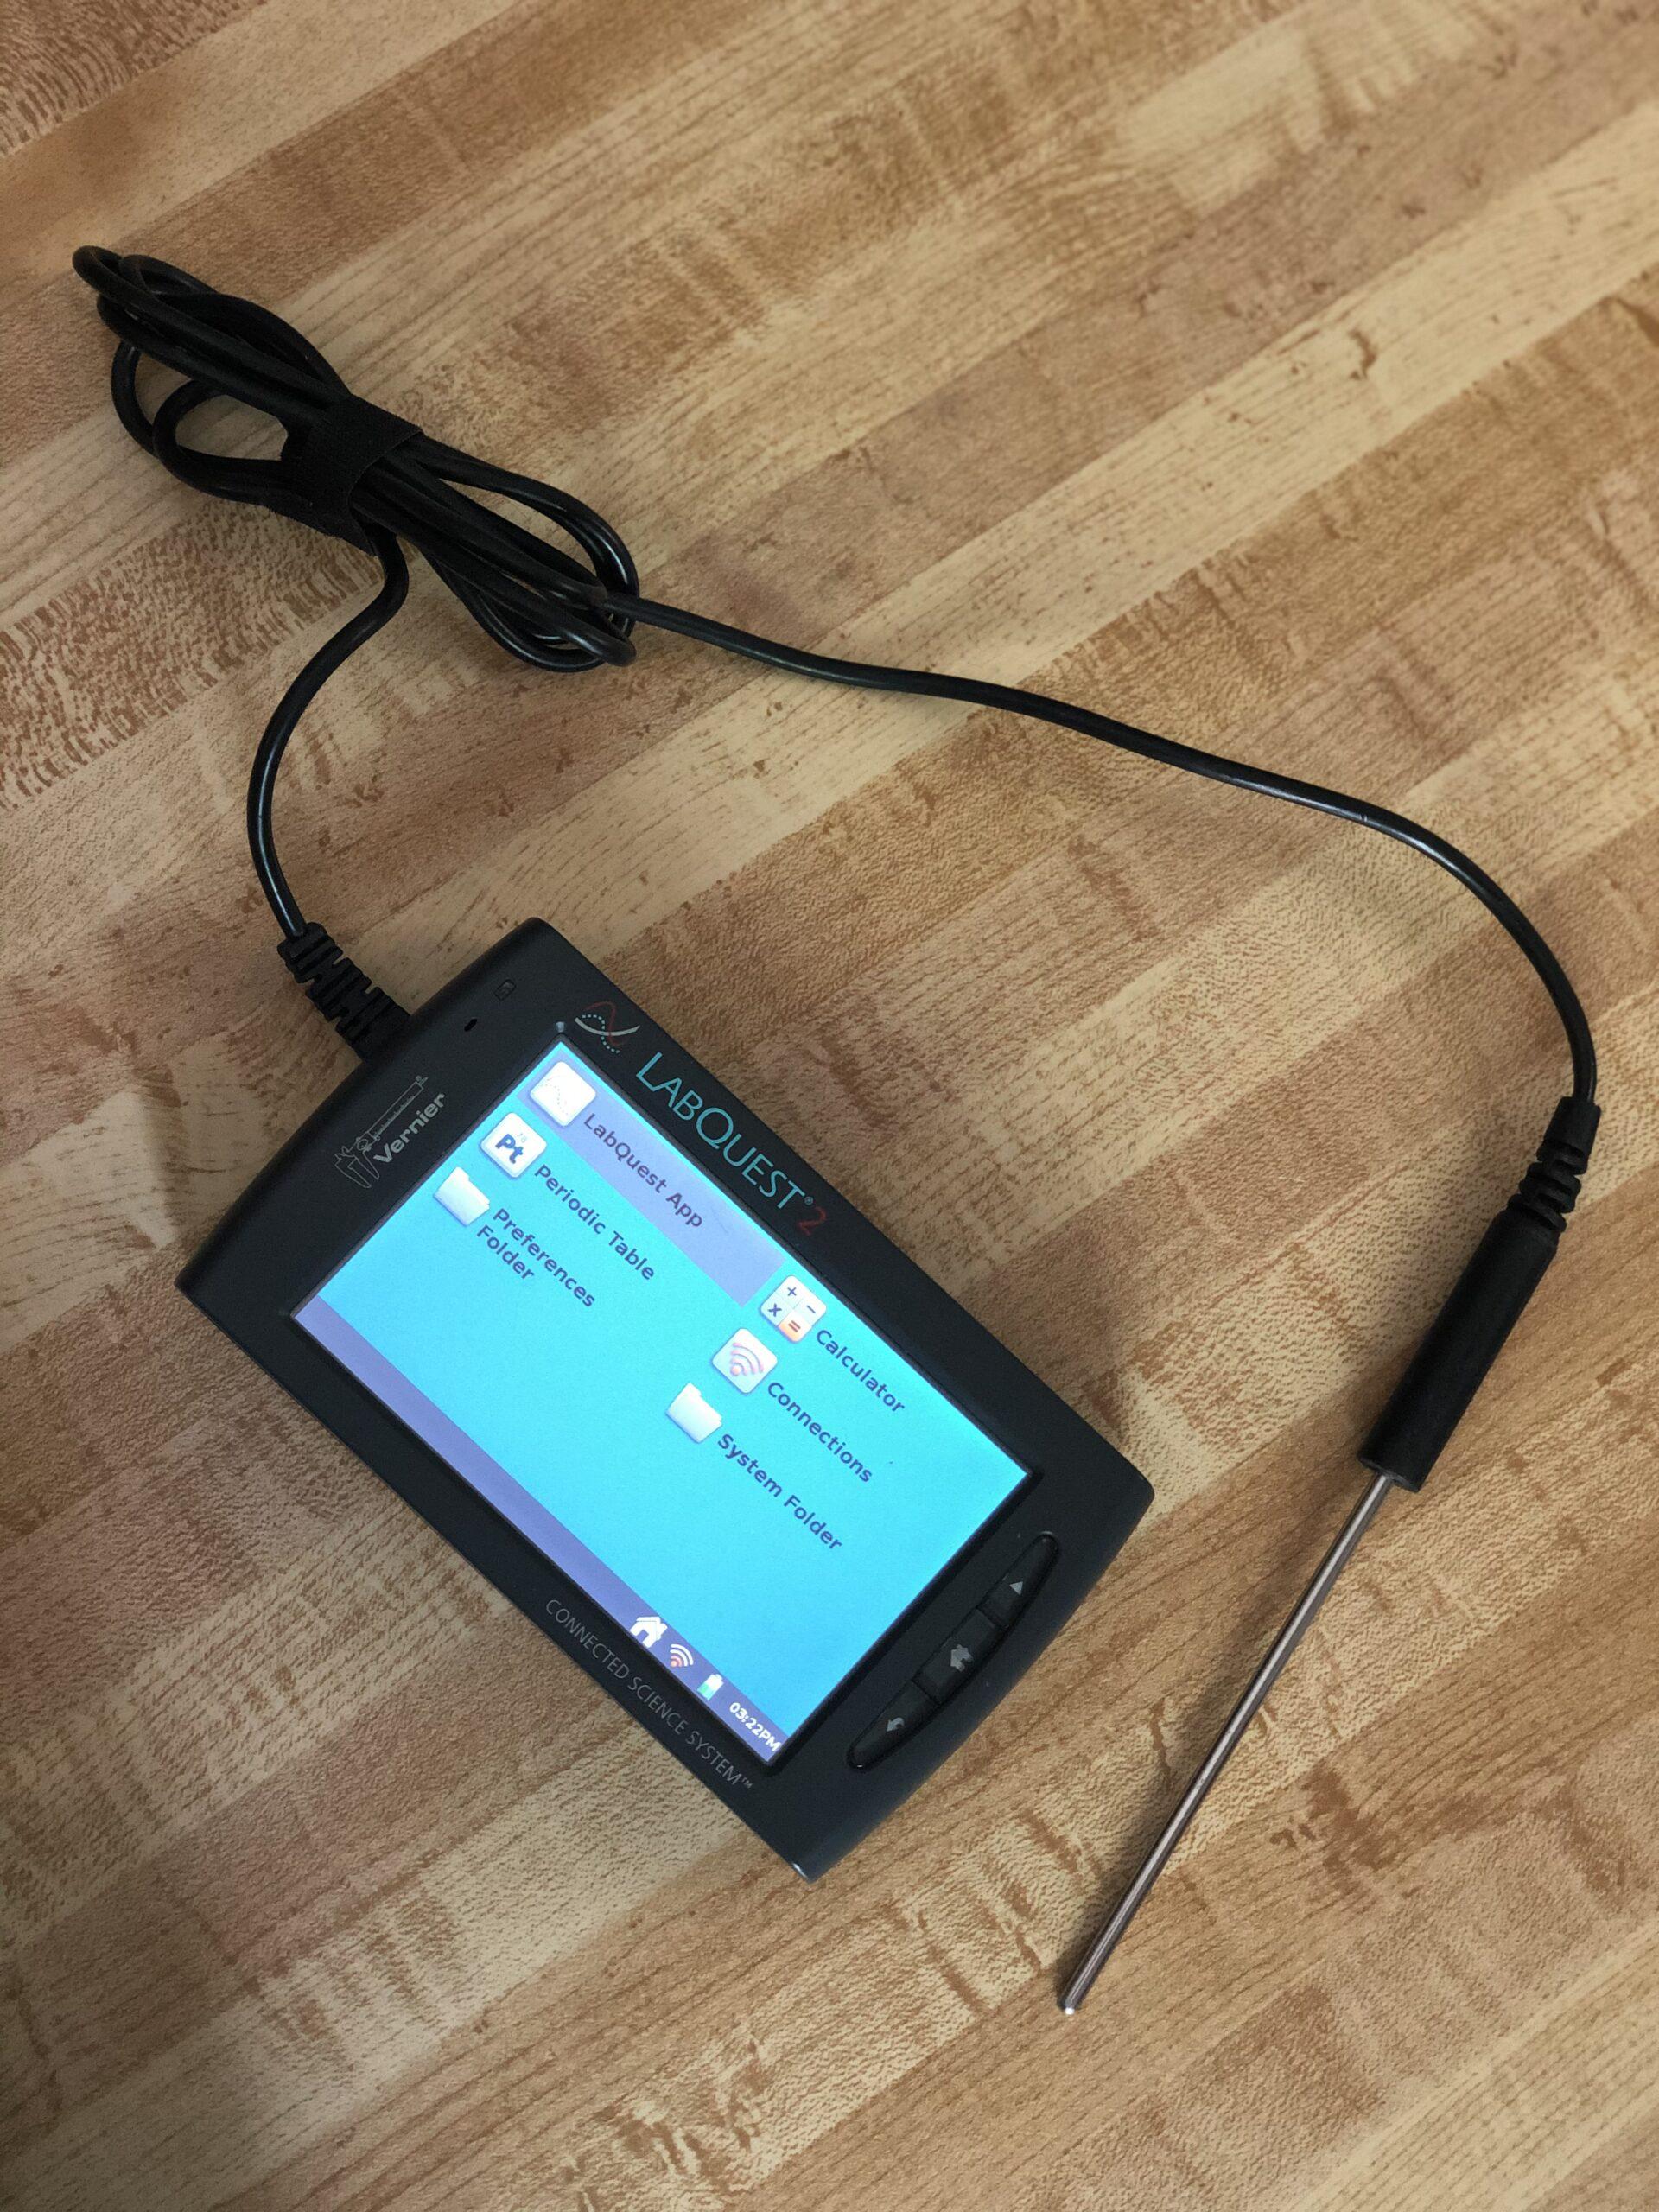 Talking LabQuest setup with temperature sensor